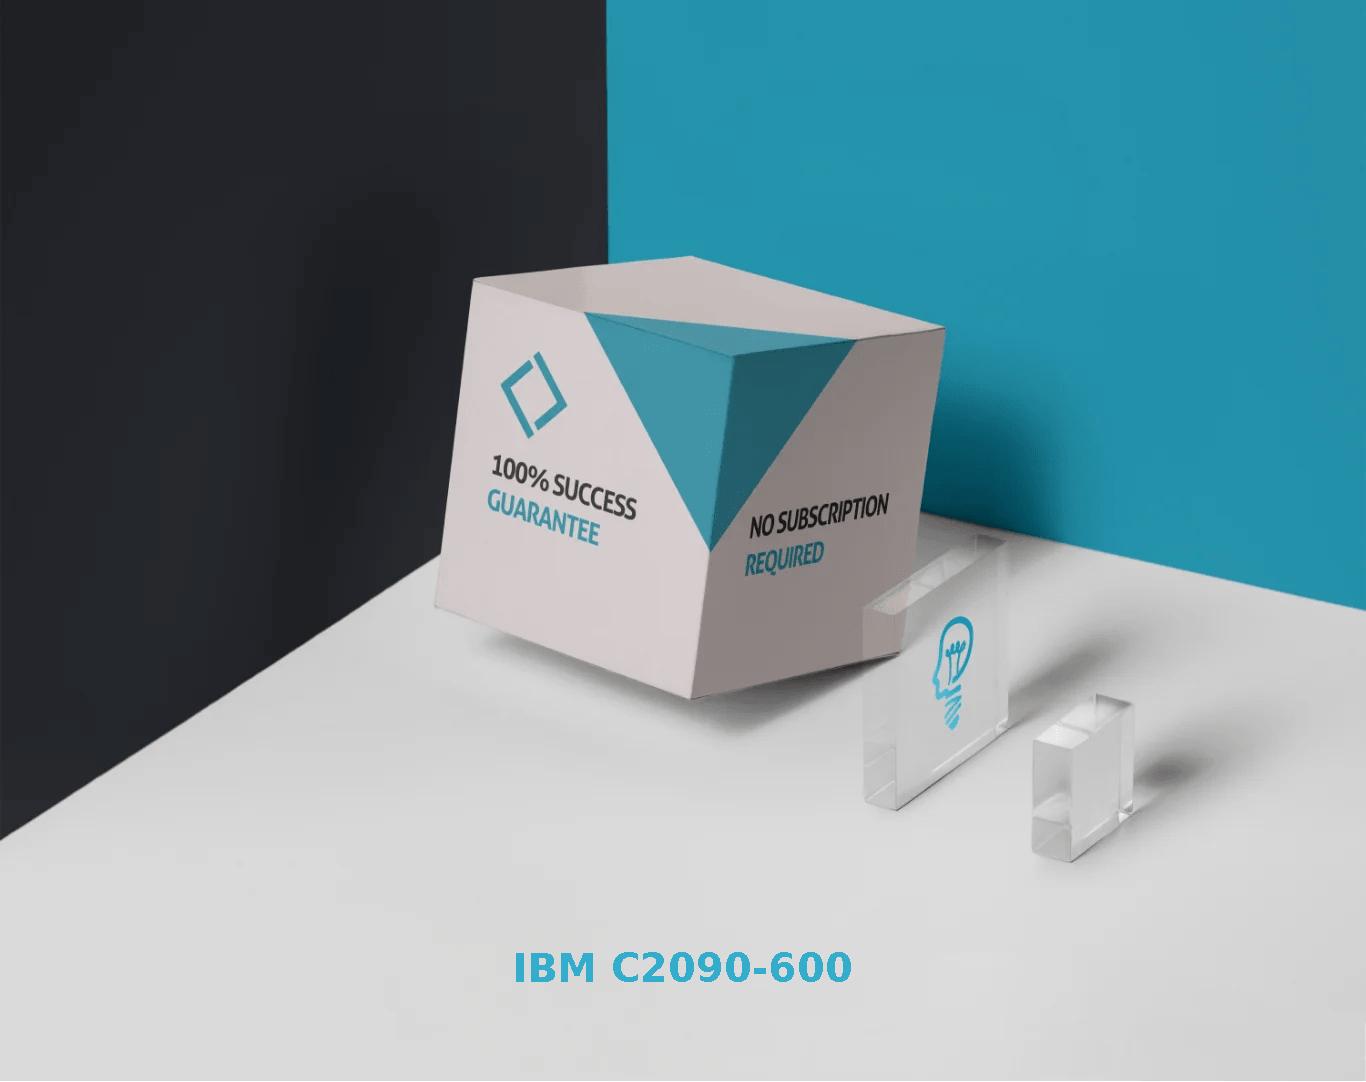 IBM C2090-600 Exams